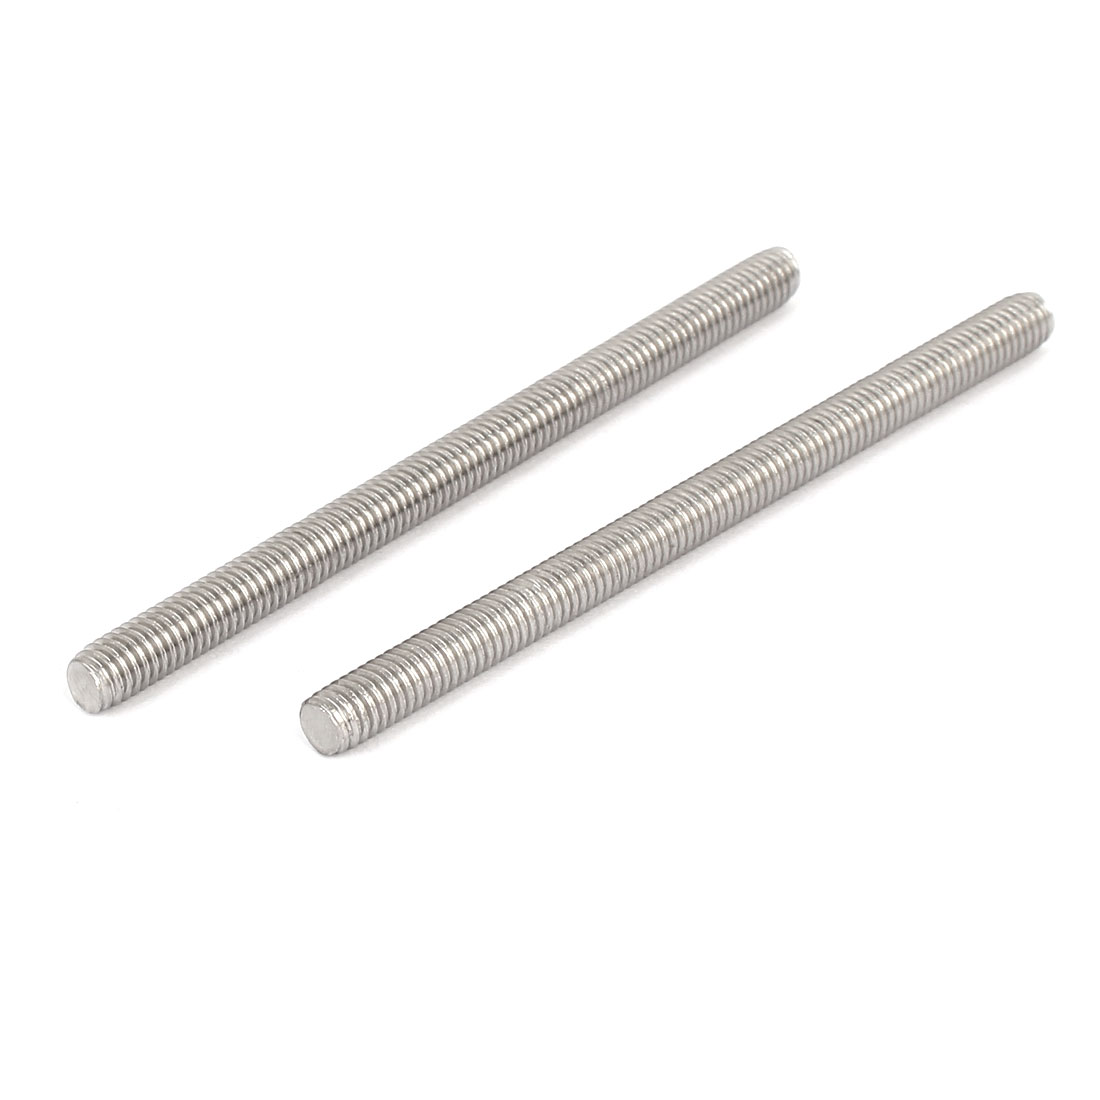 M6-x-90mm-304-Stainless-Steel-Fully-Threaded-Rod-Bar-Studs-Fastener-10-Pcs